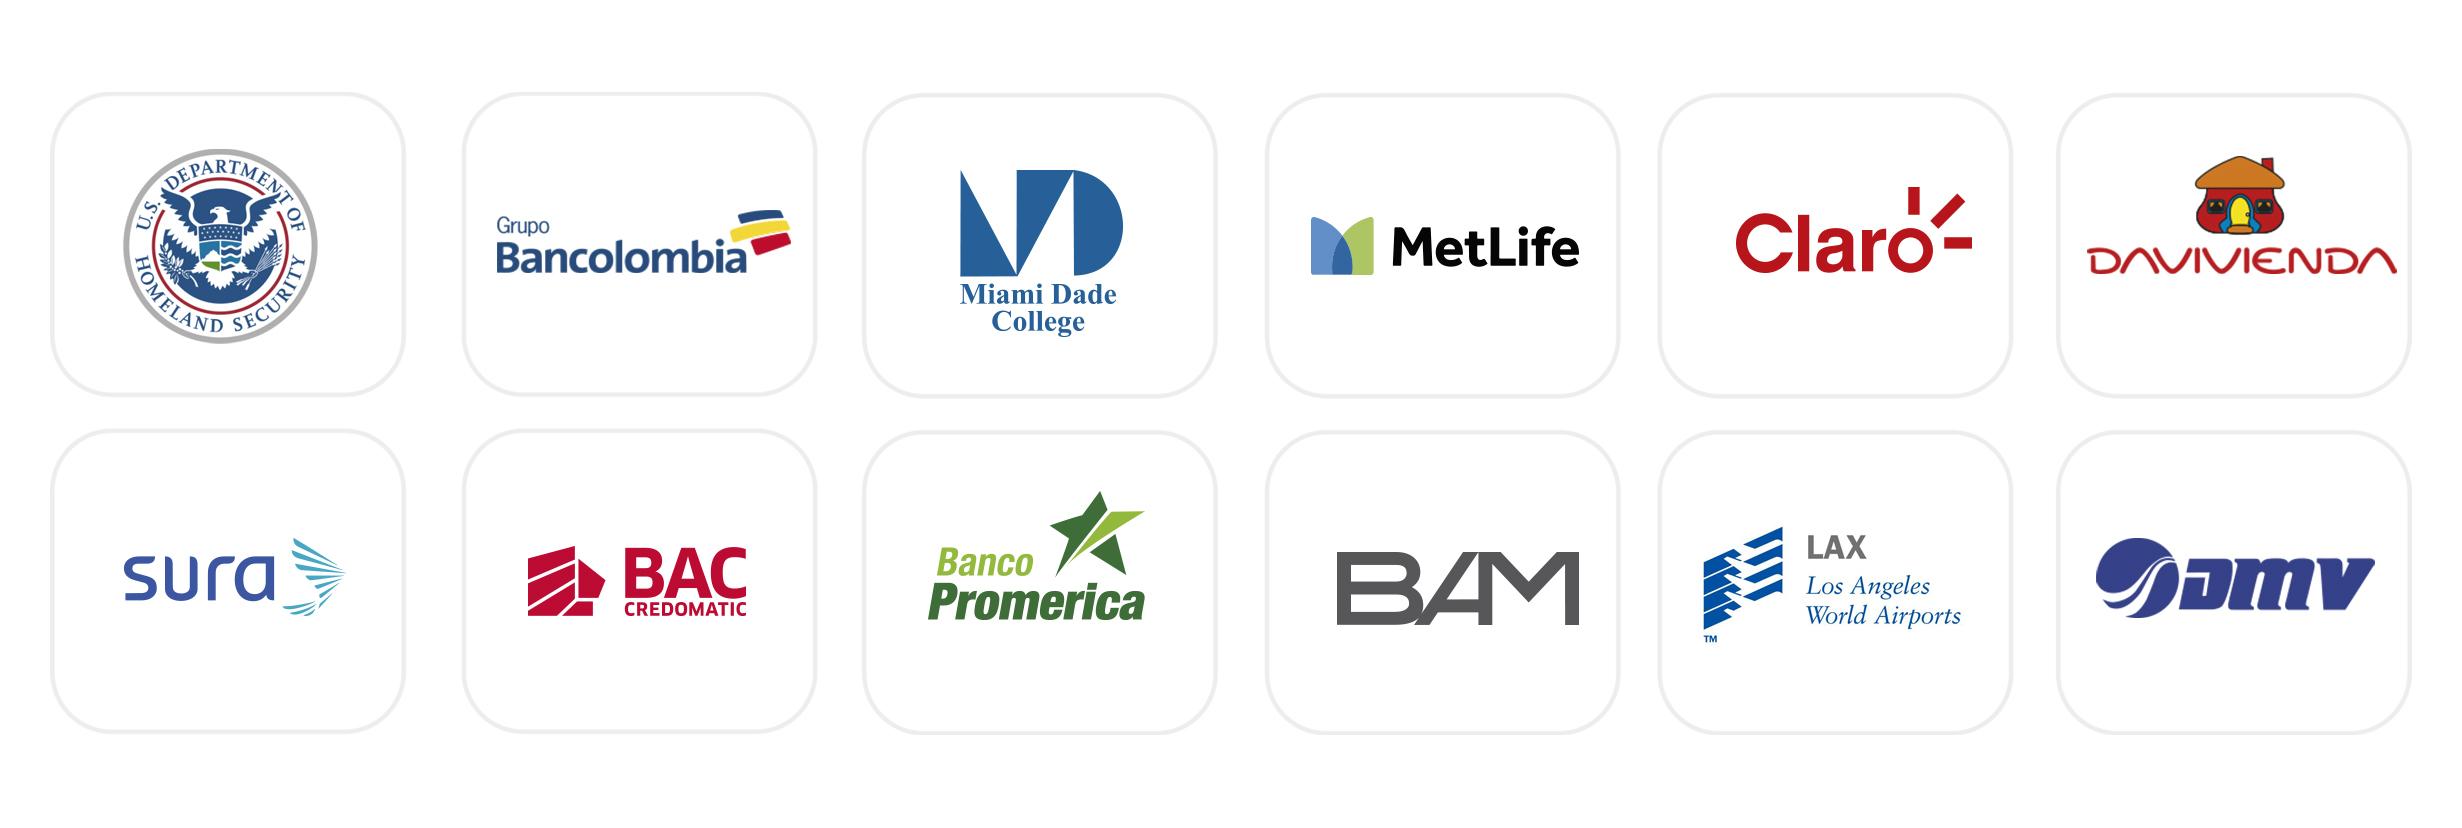 Banner Iconos logos2.jpg